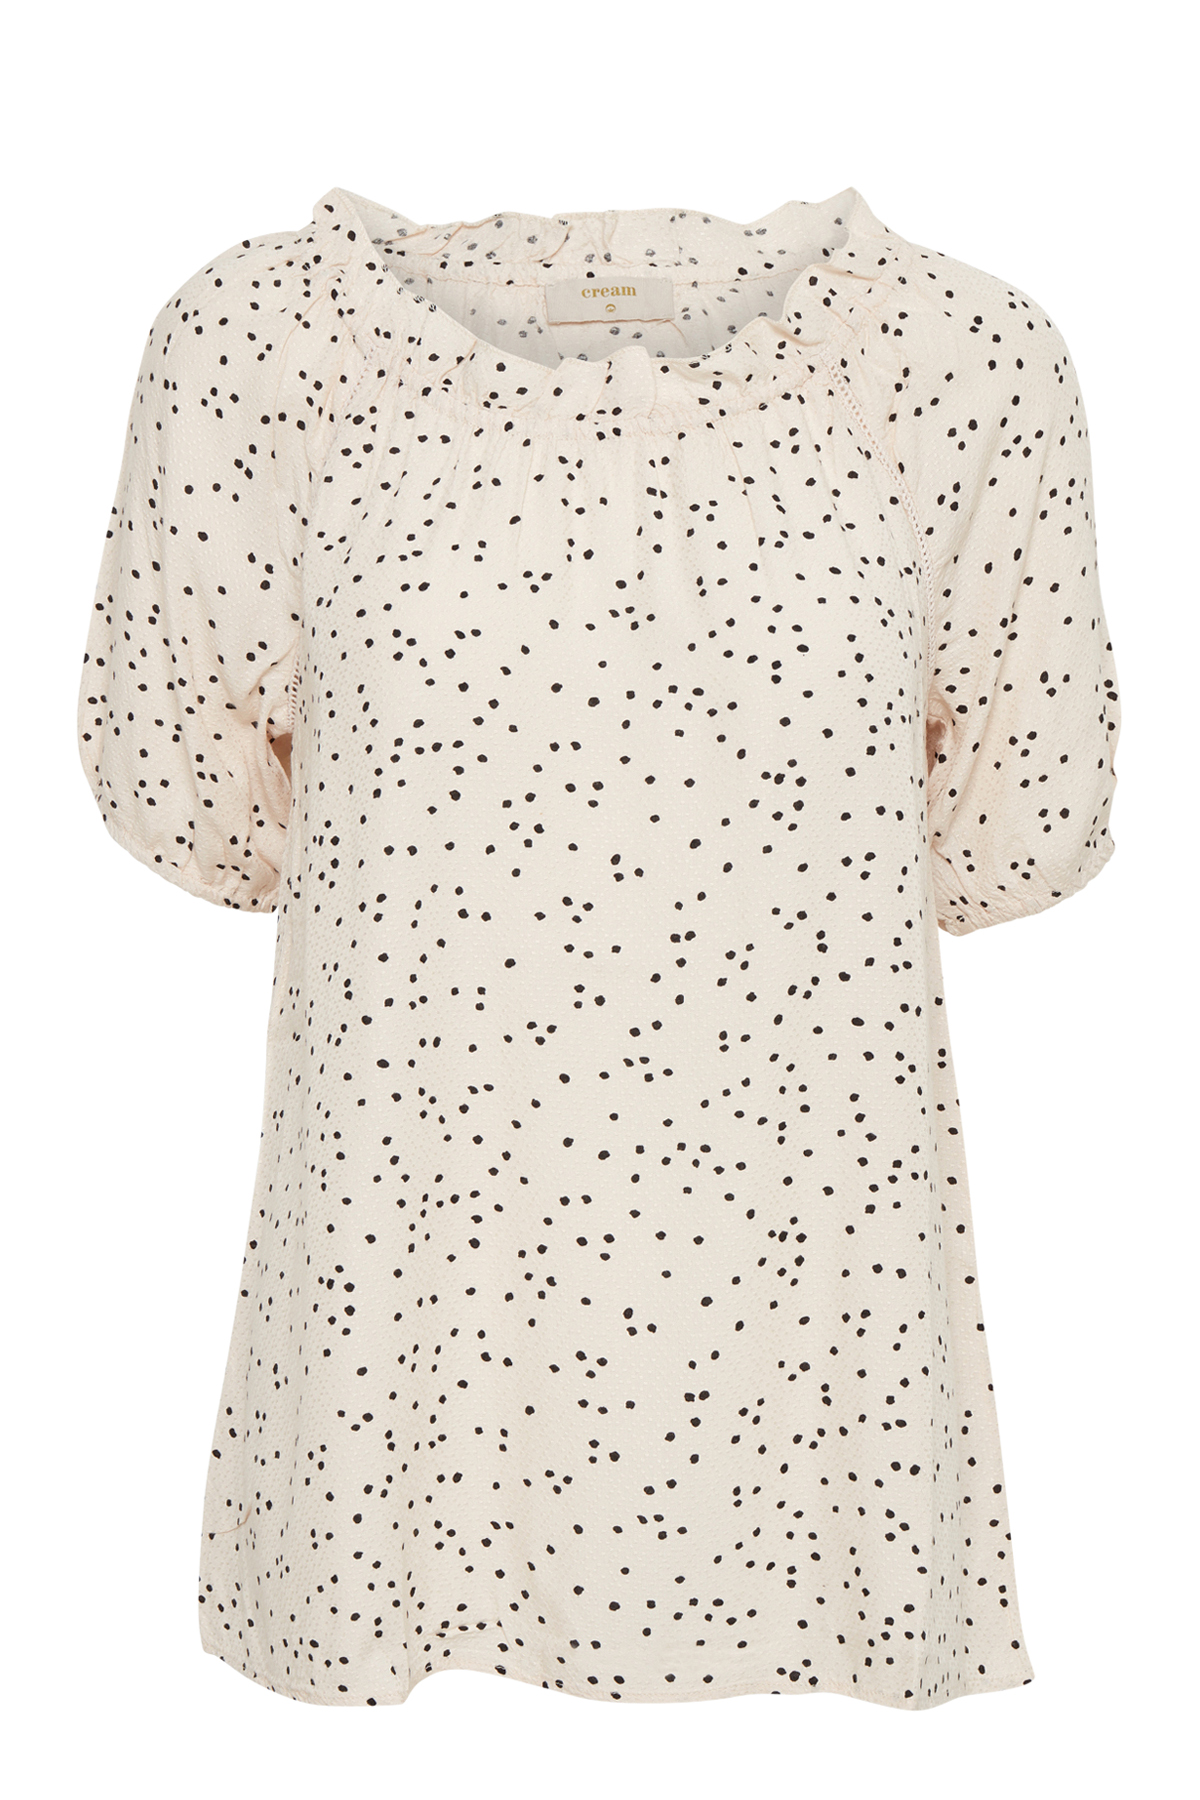 Image of Cream Dame Kortærmet bluse - Creme